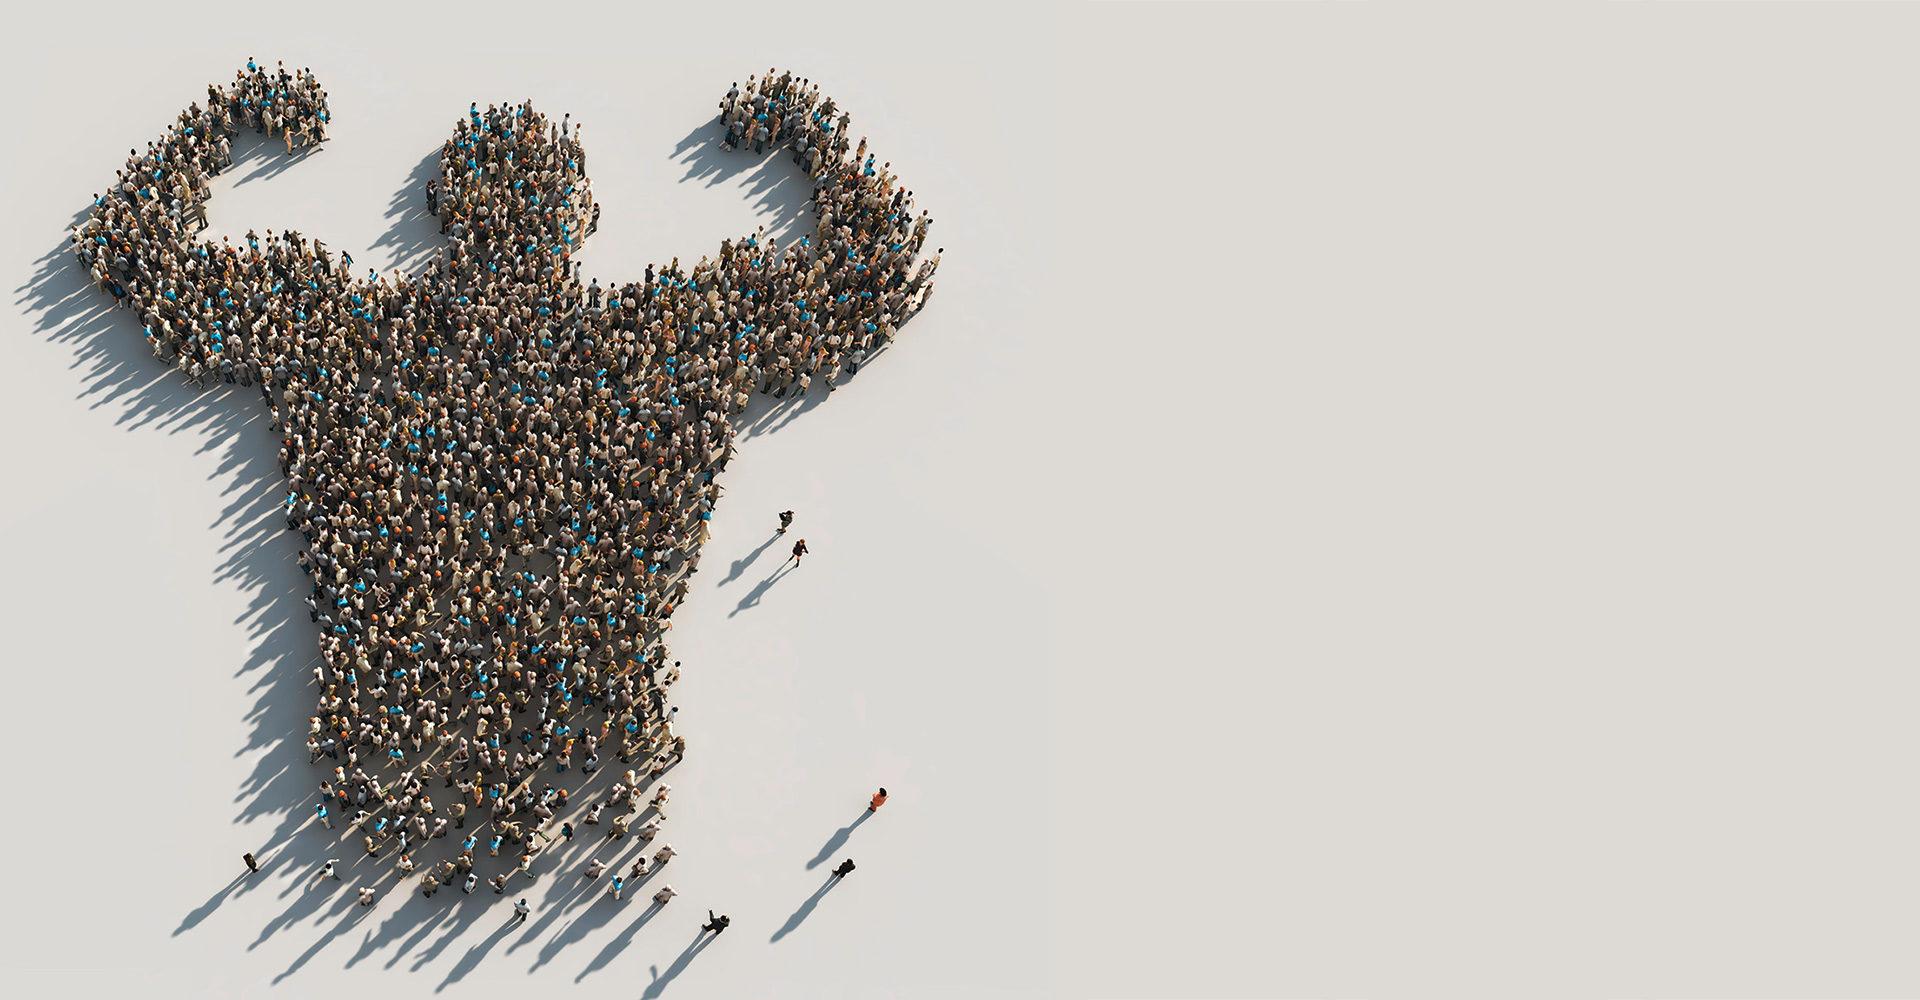 Arbeitgebermarke, Image, Fachkräfte